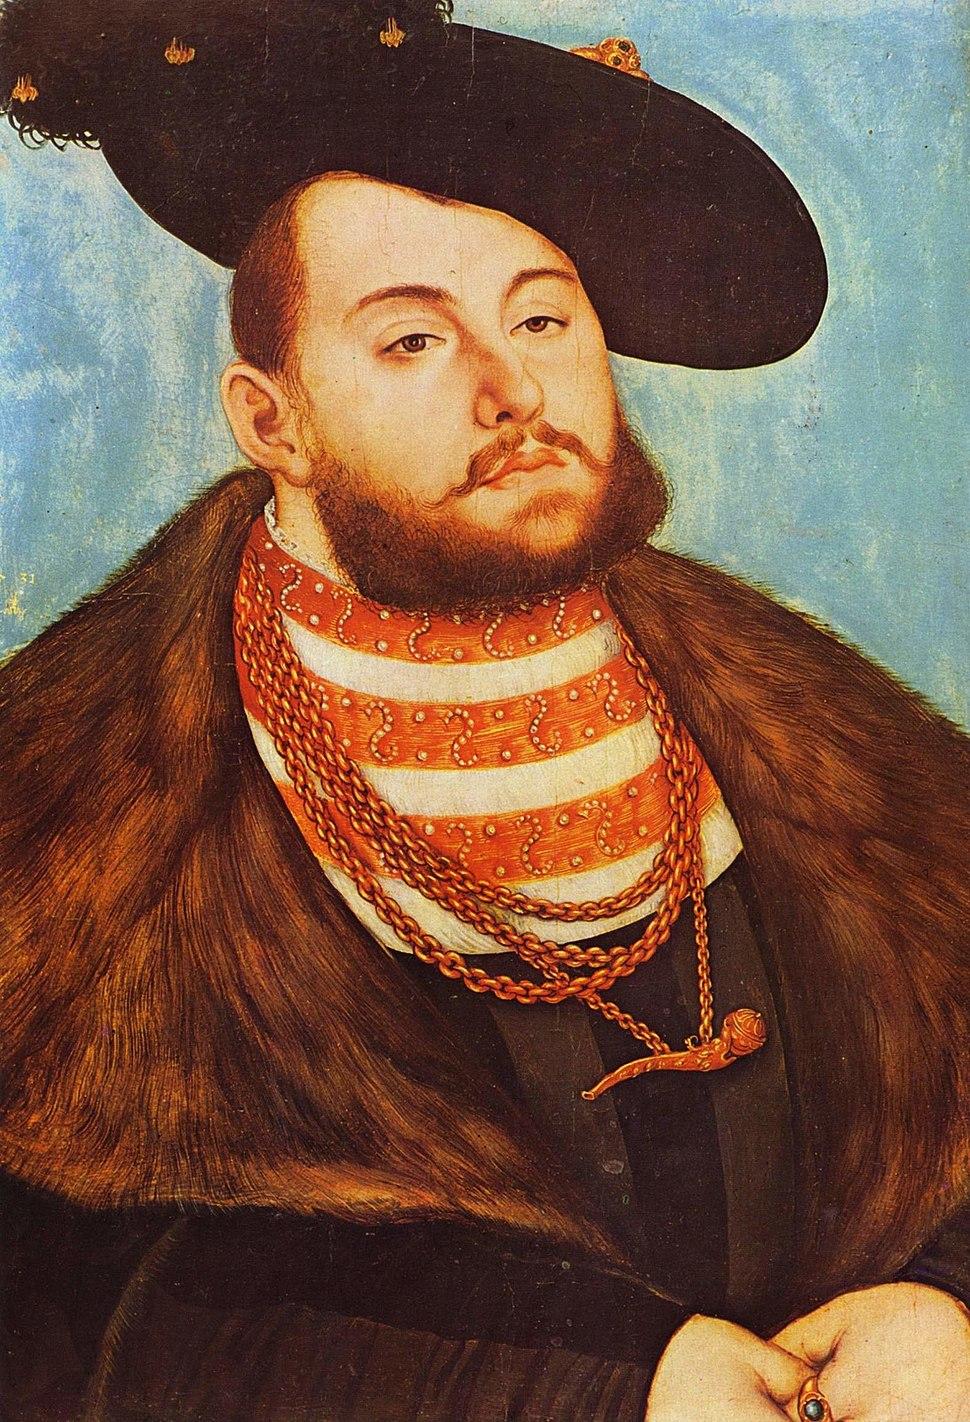 Lucas Cranach d. %C3%84. 044.jpg